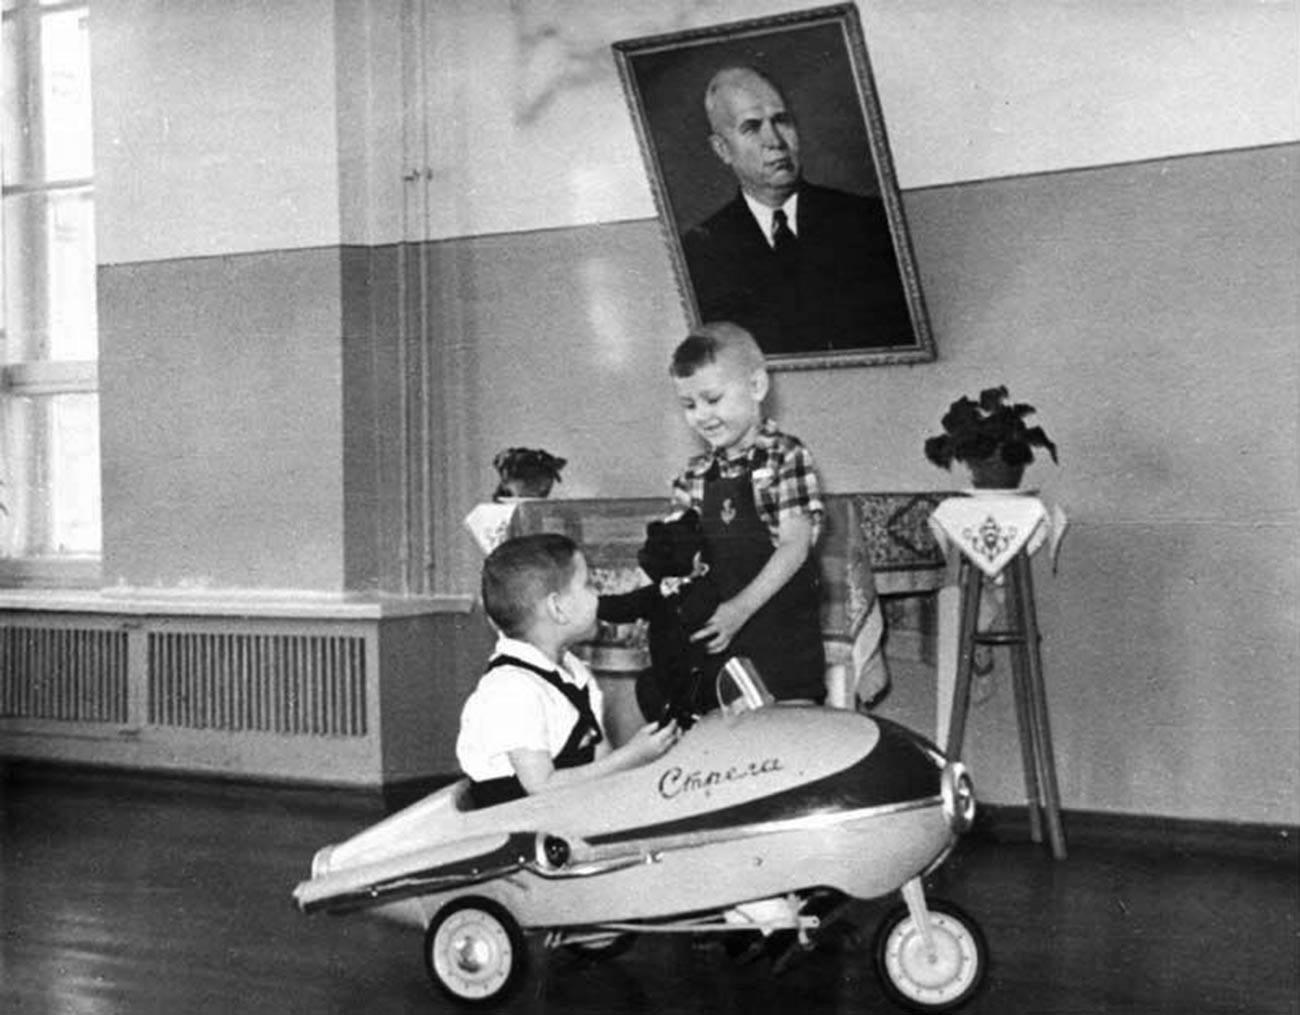 A Strela pedal car, 1962